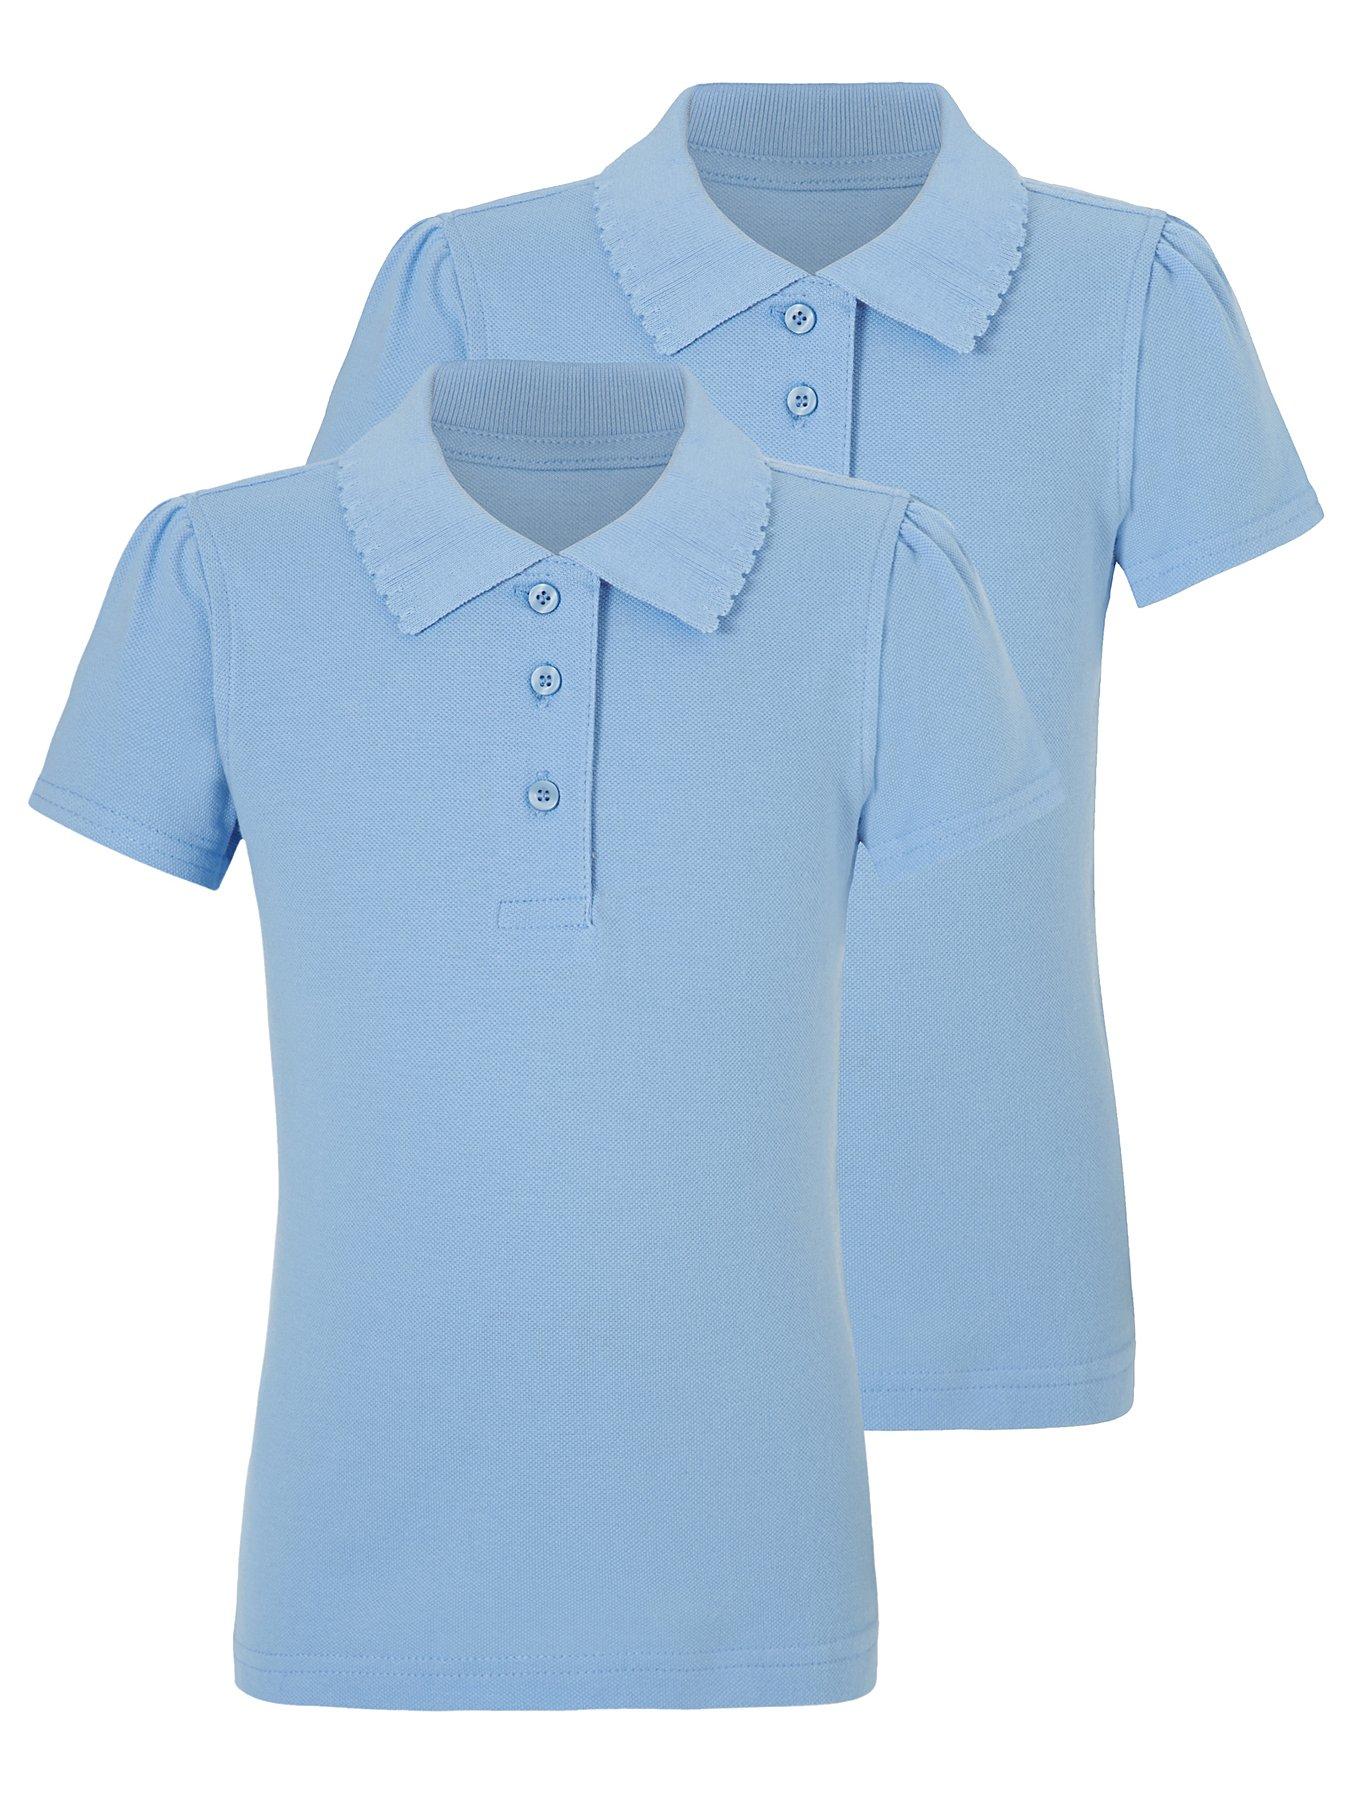 Girls Light Blue Scallop School Polo Shirt 2 Pack. Reset eb63c353b